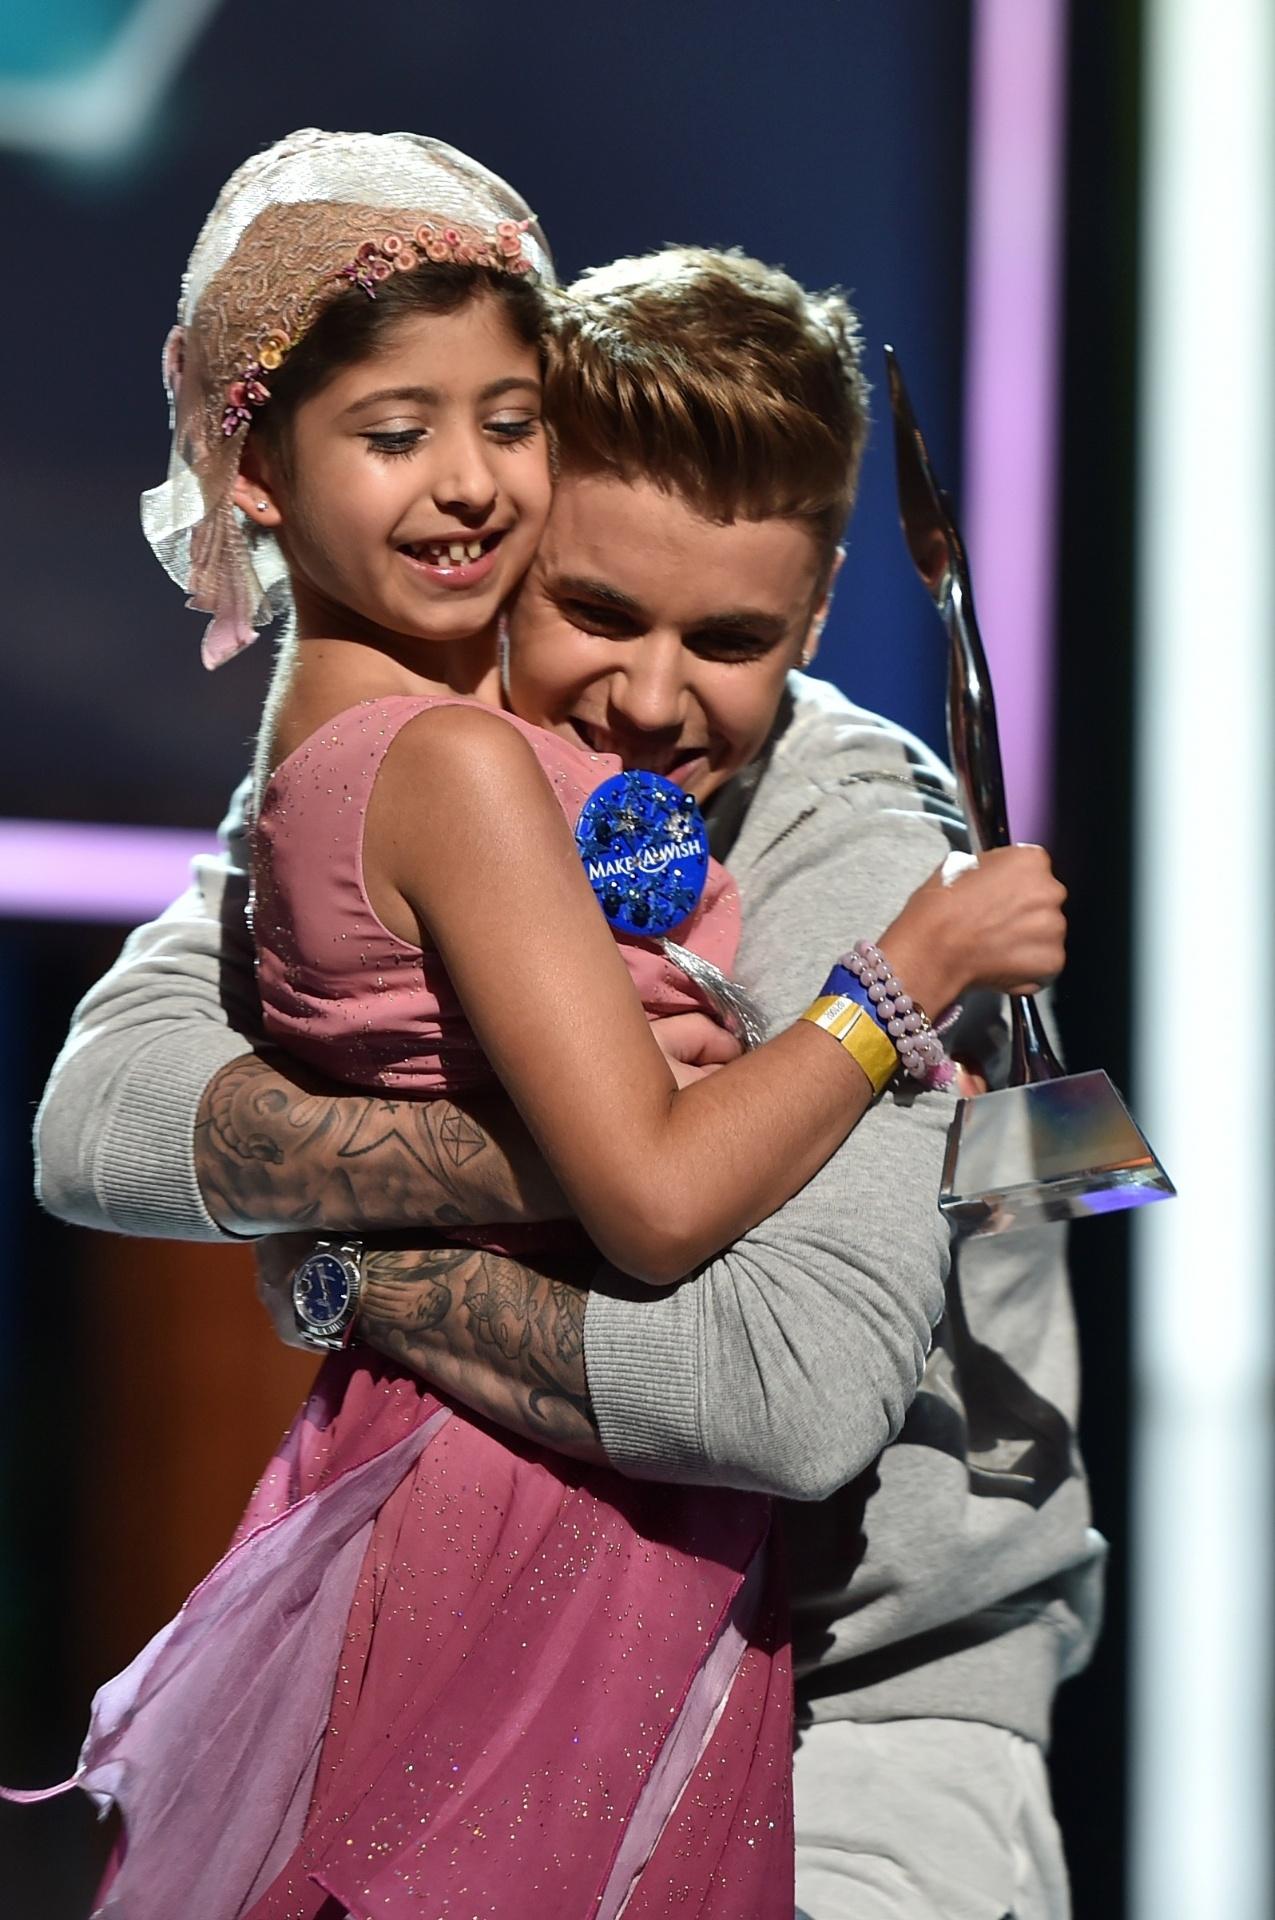 Justin Bieber recebe o prêmio de Grace Kesablak no palco do Young Hollywood Awards 2014